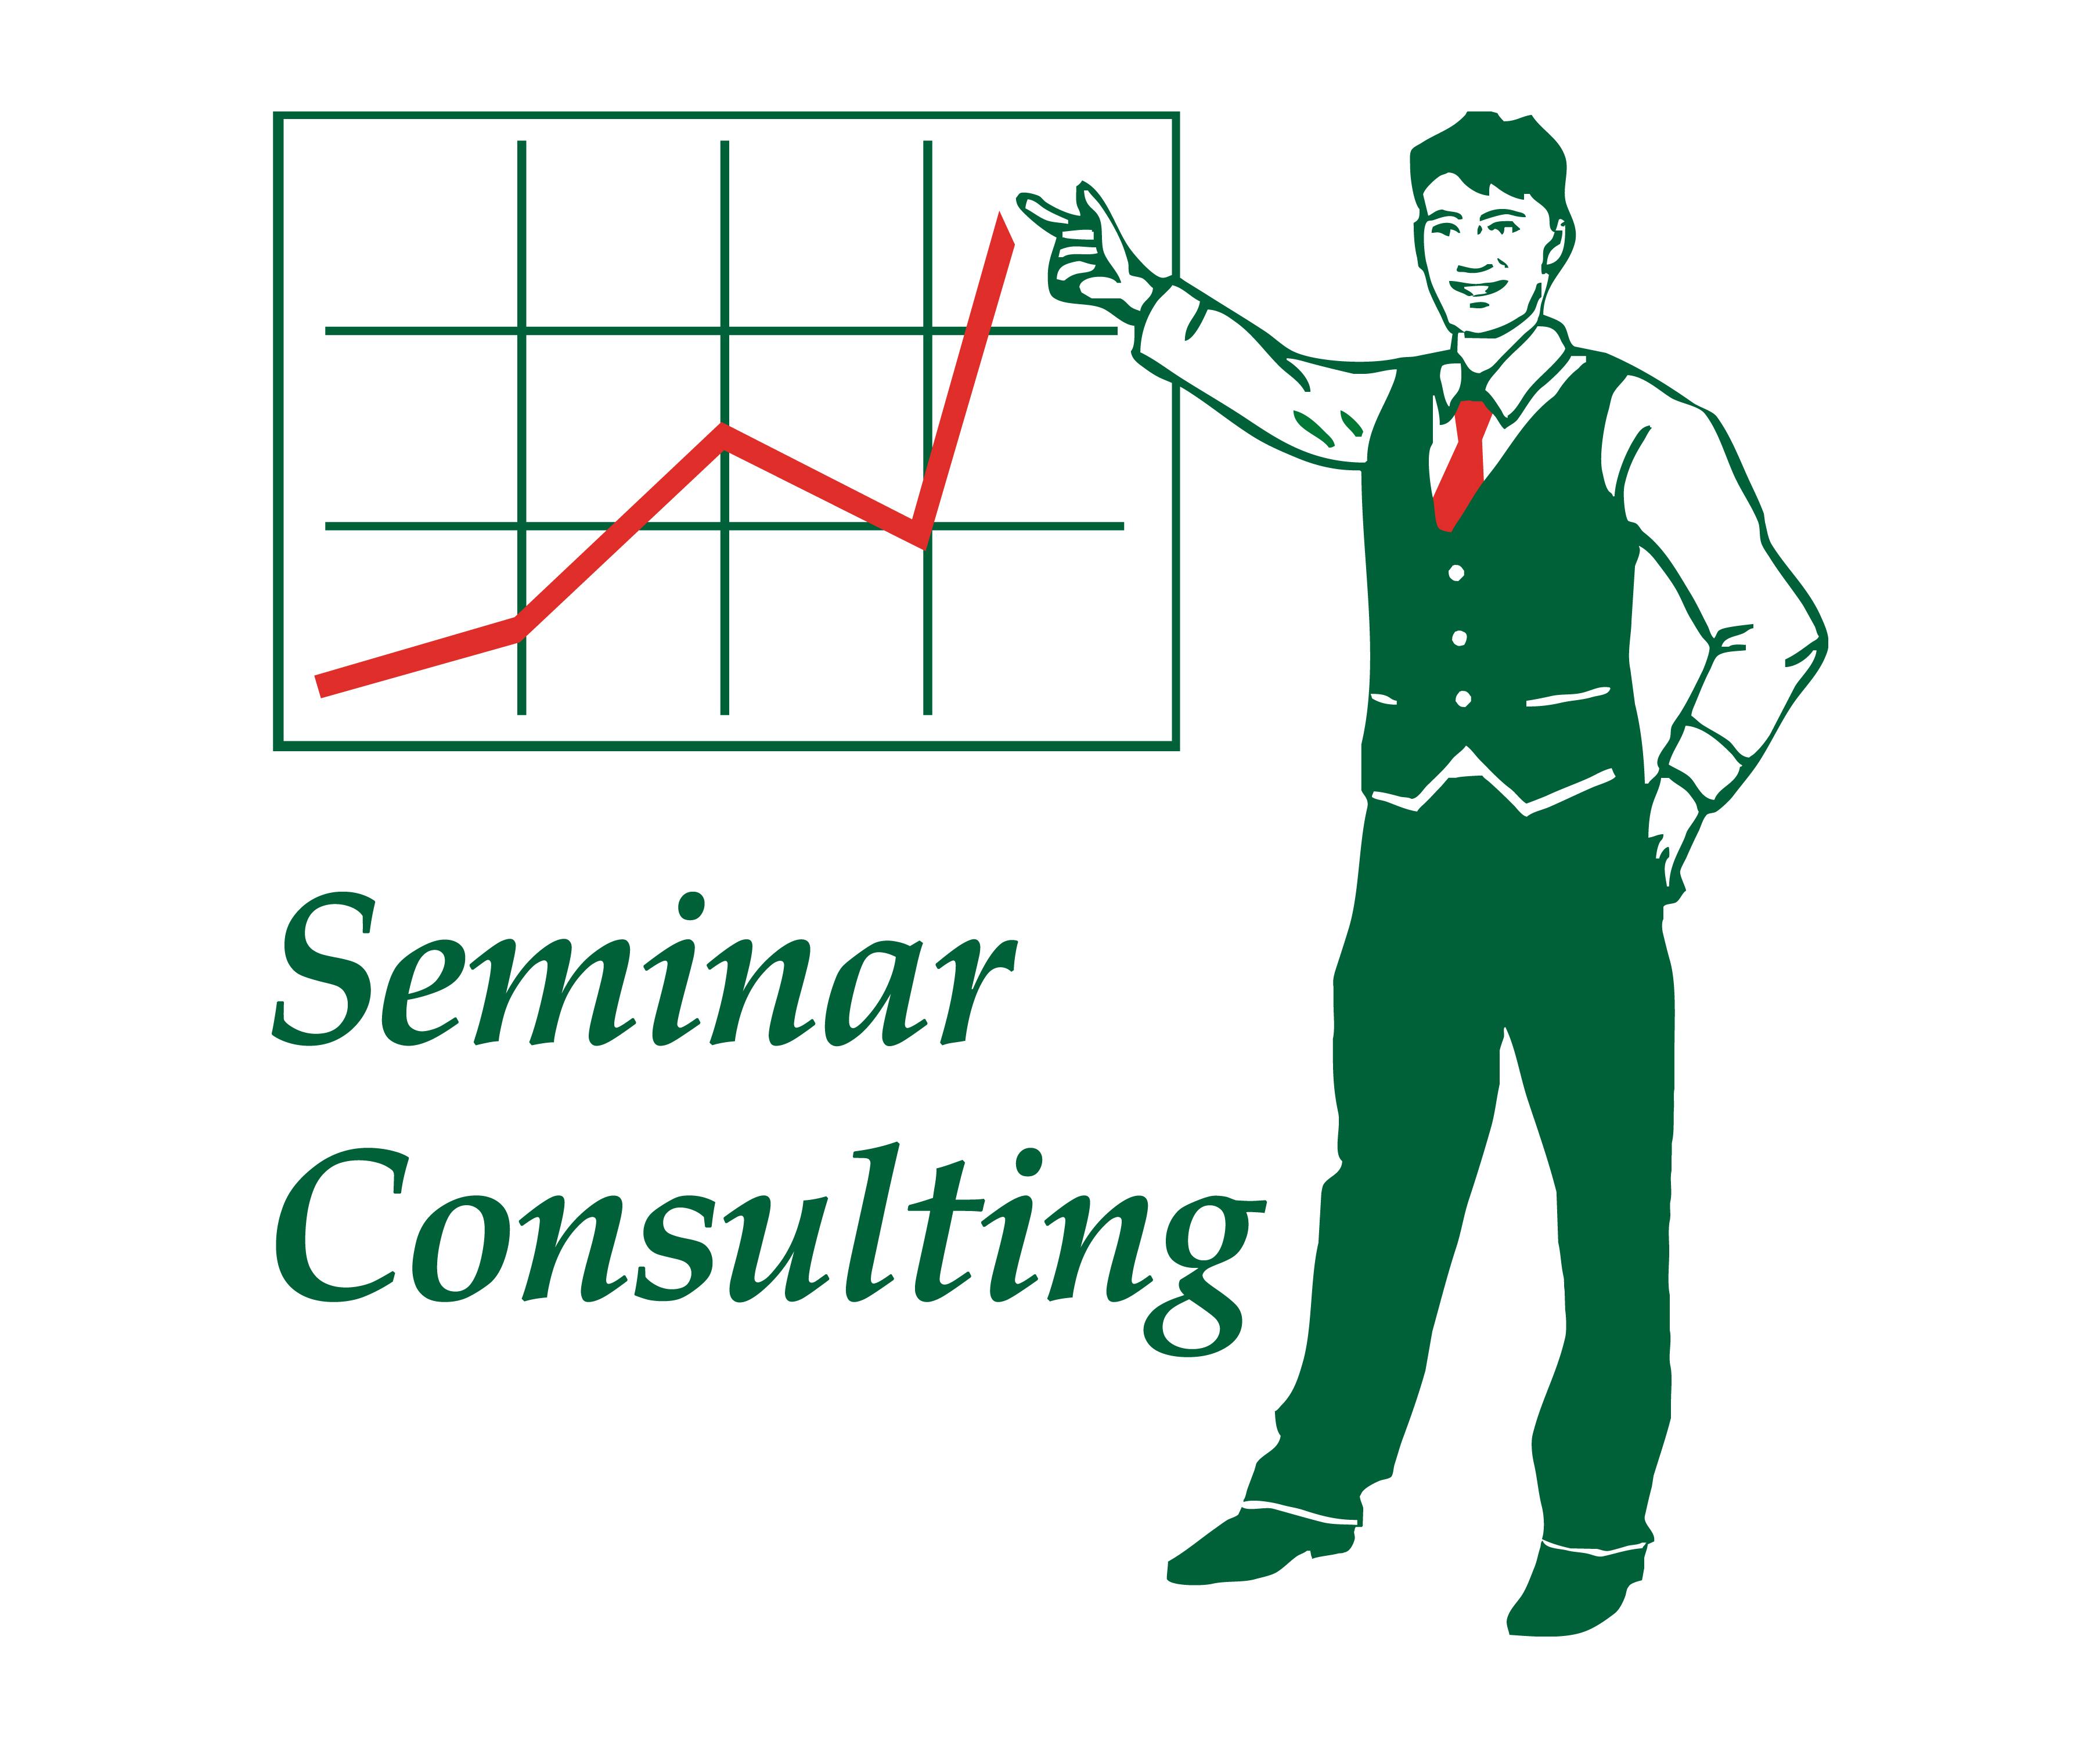 Seminar Consulting